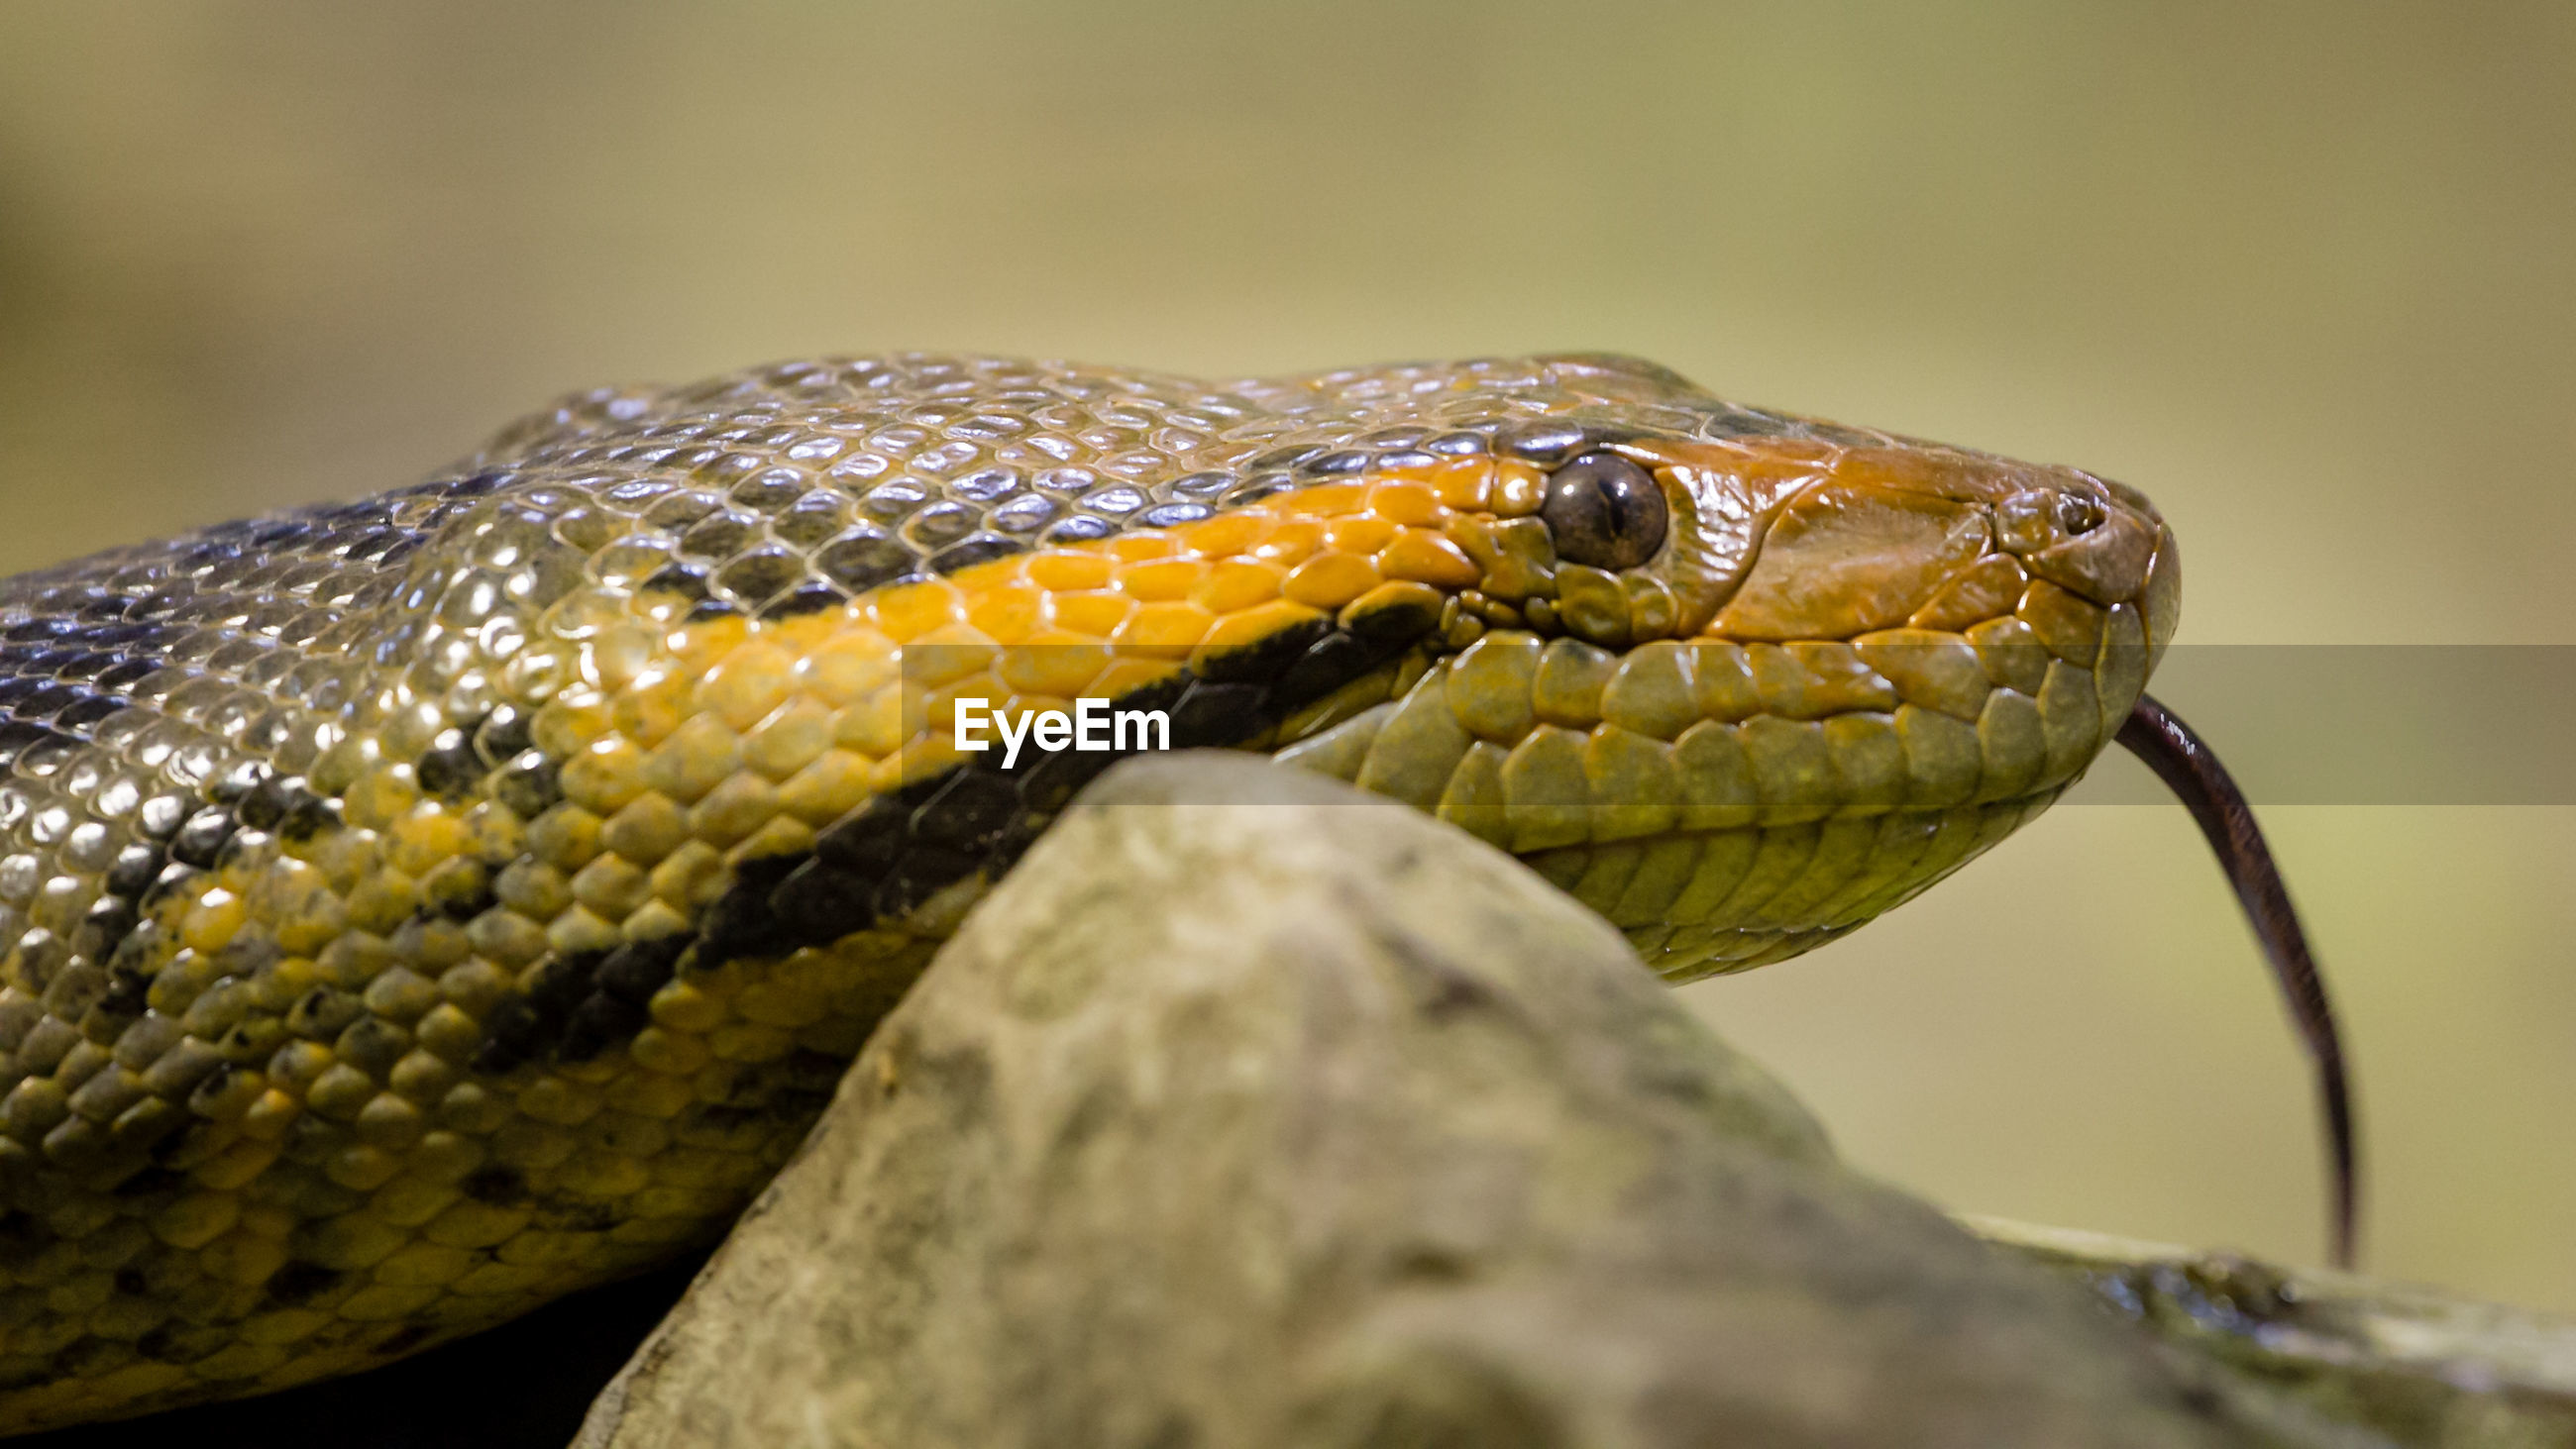 Close-up of snake on rock